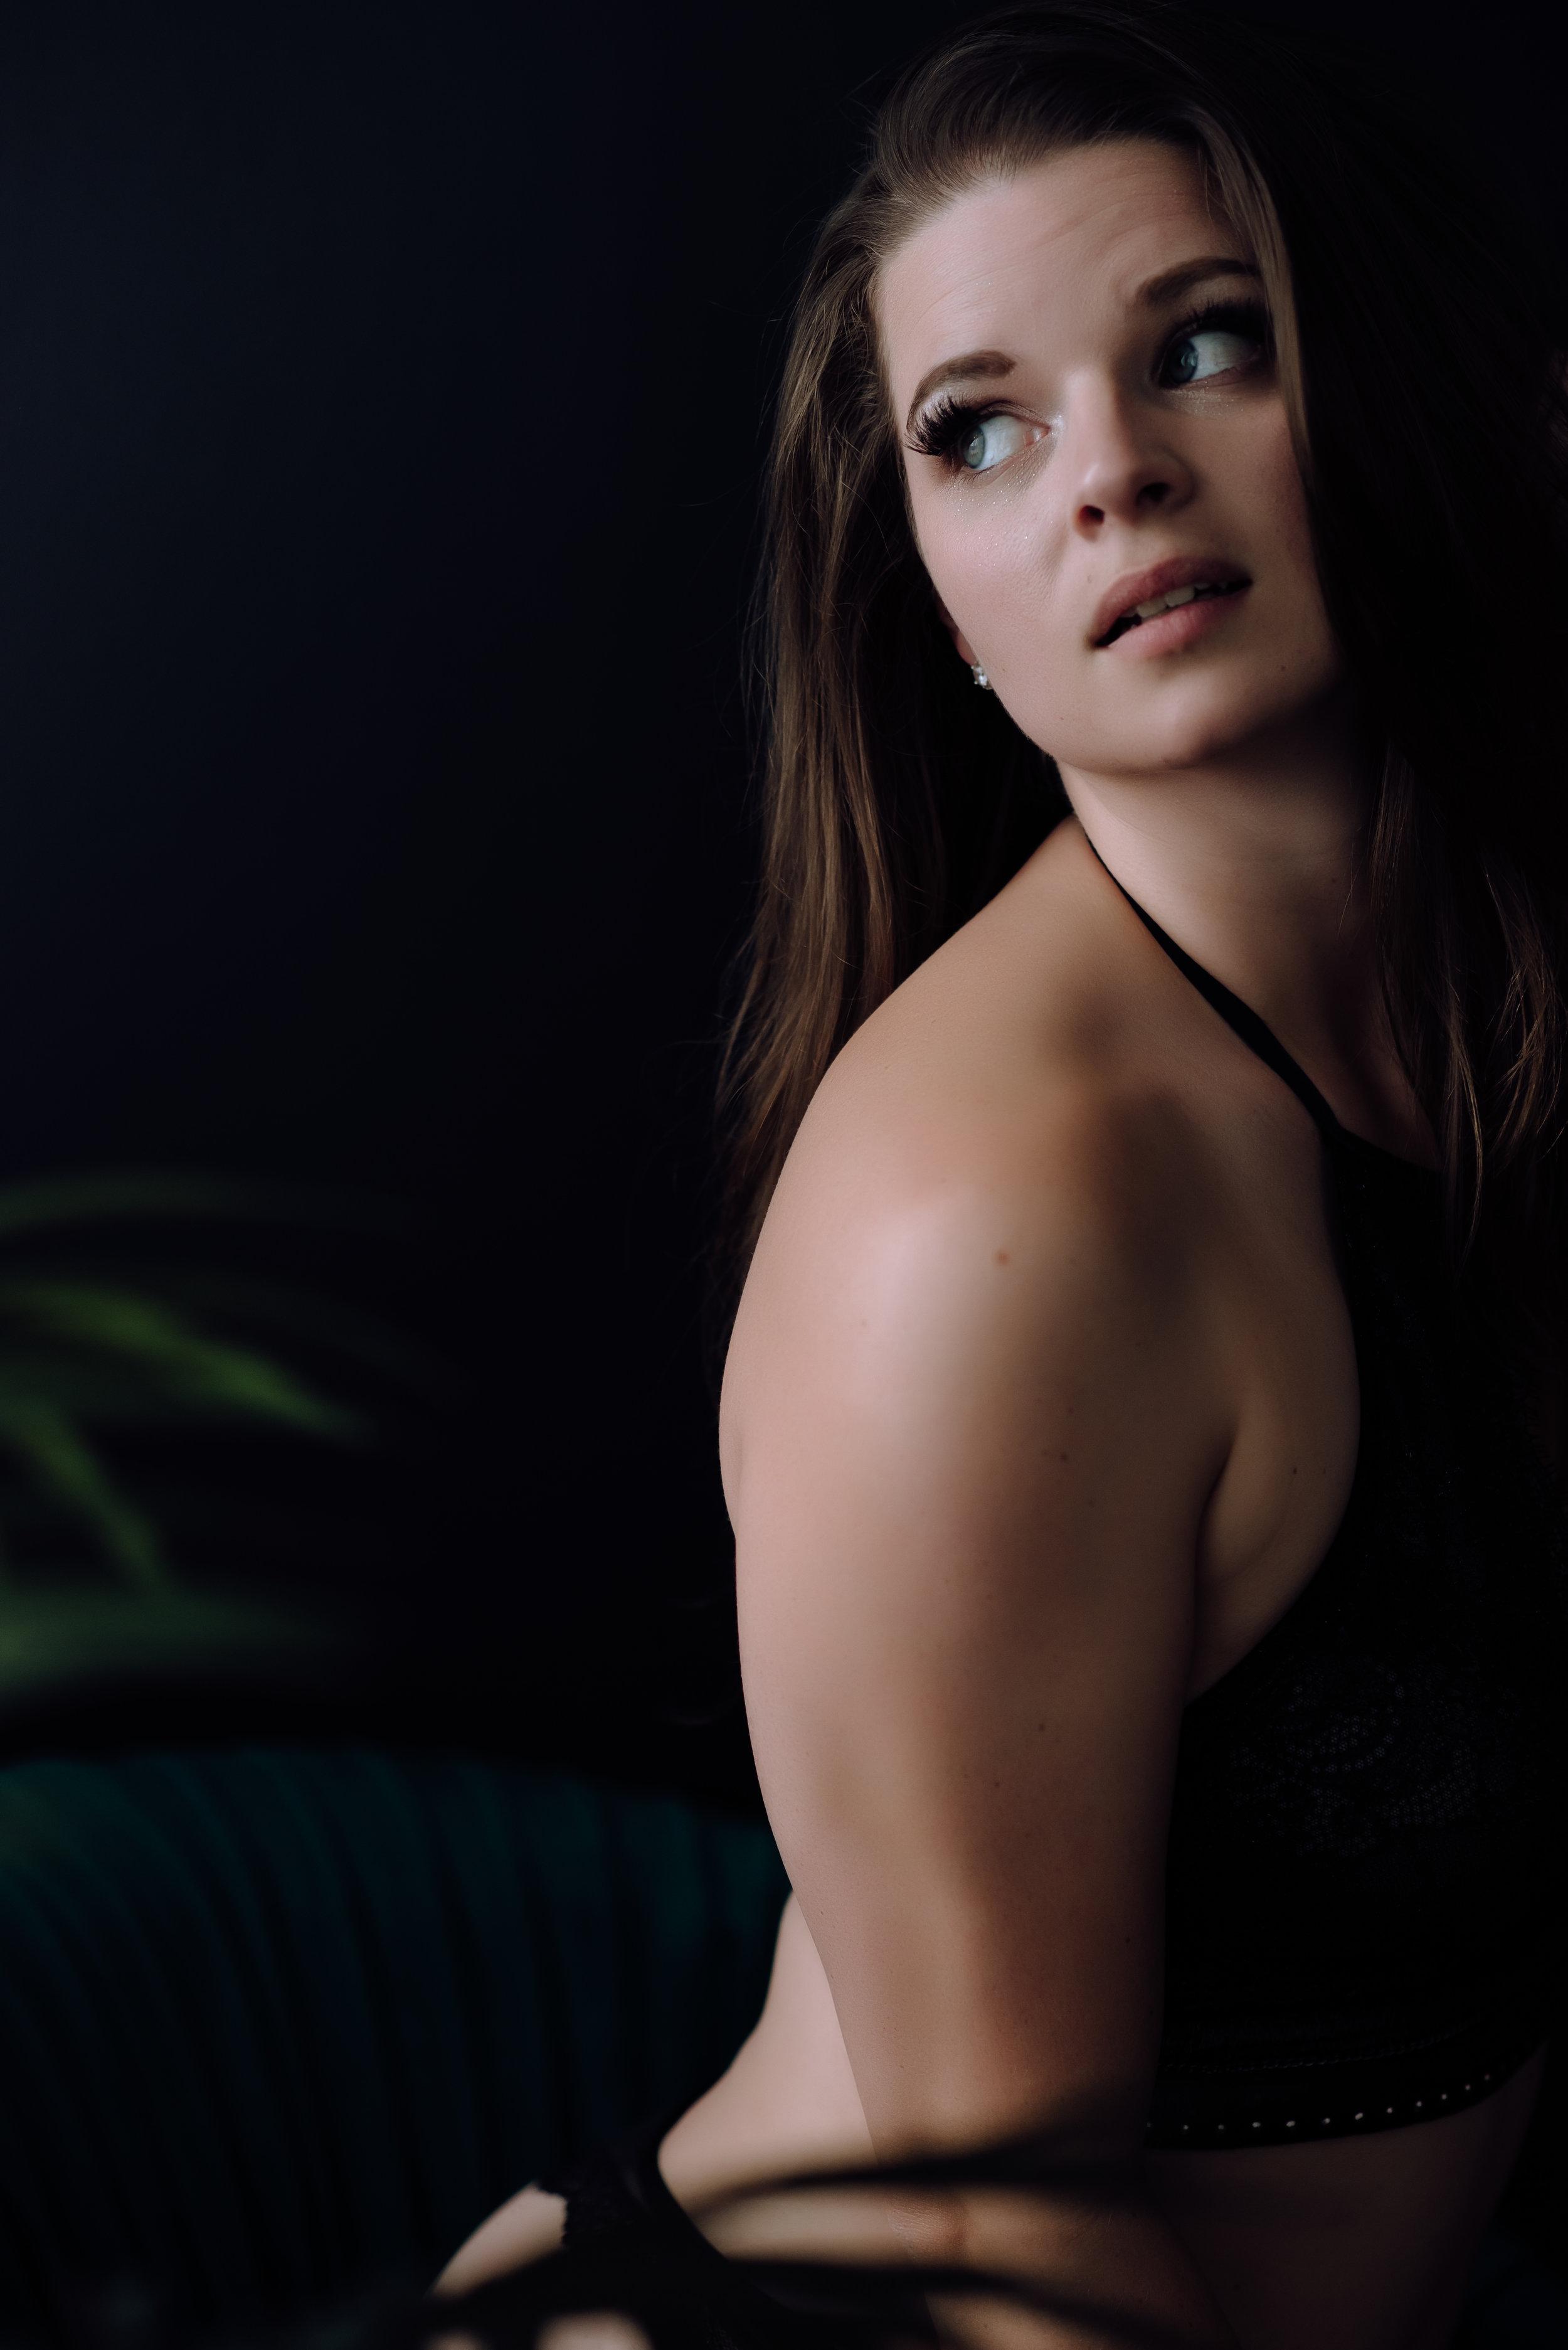 boudoir-photography-best-in-berks-13.jpg